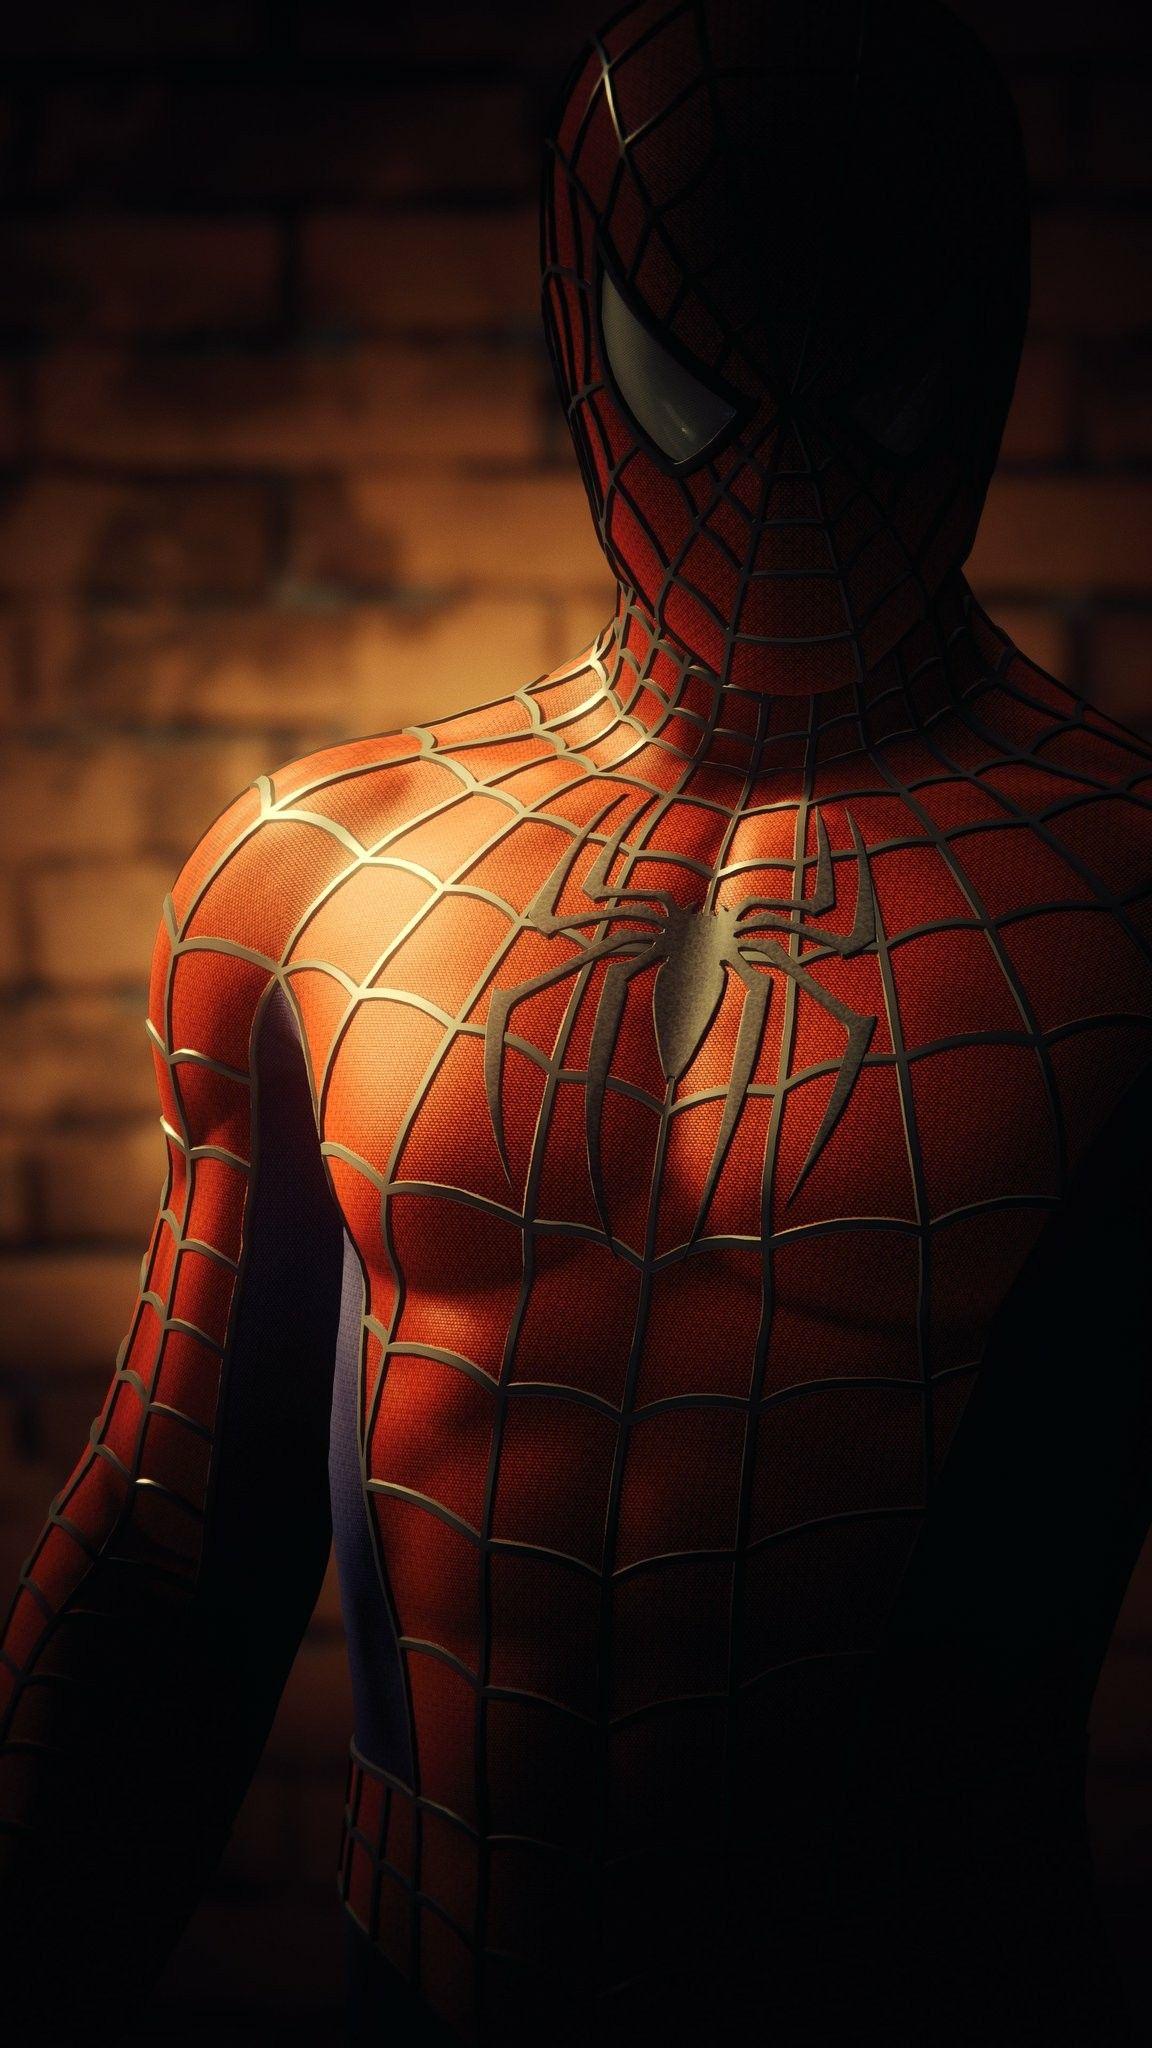 Spiderman Spiderman Marvel Superhero Posters Amazing Spiderman